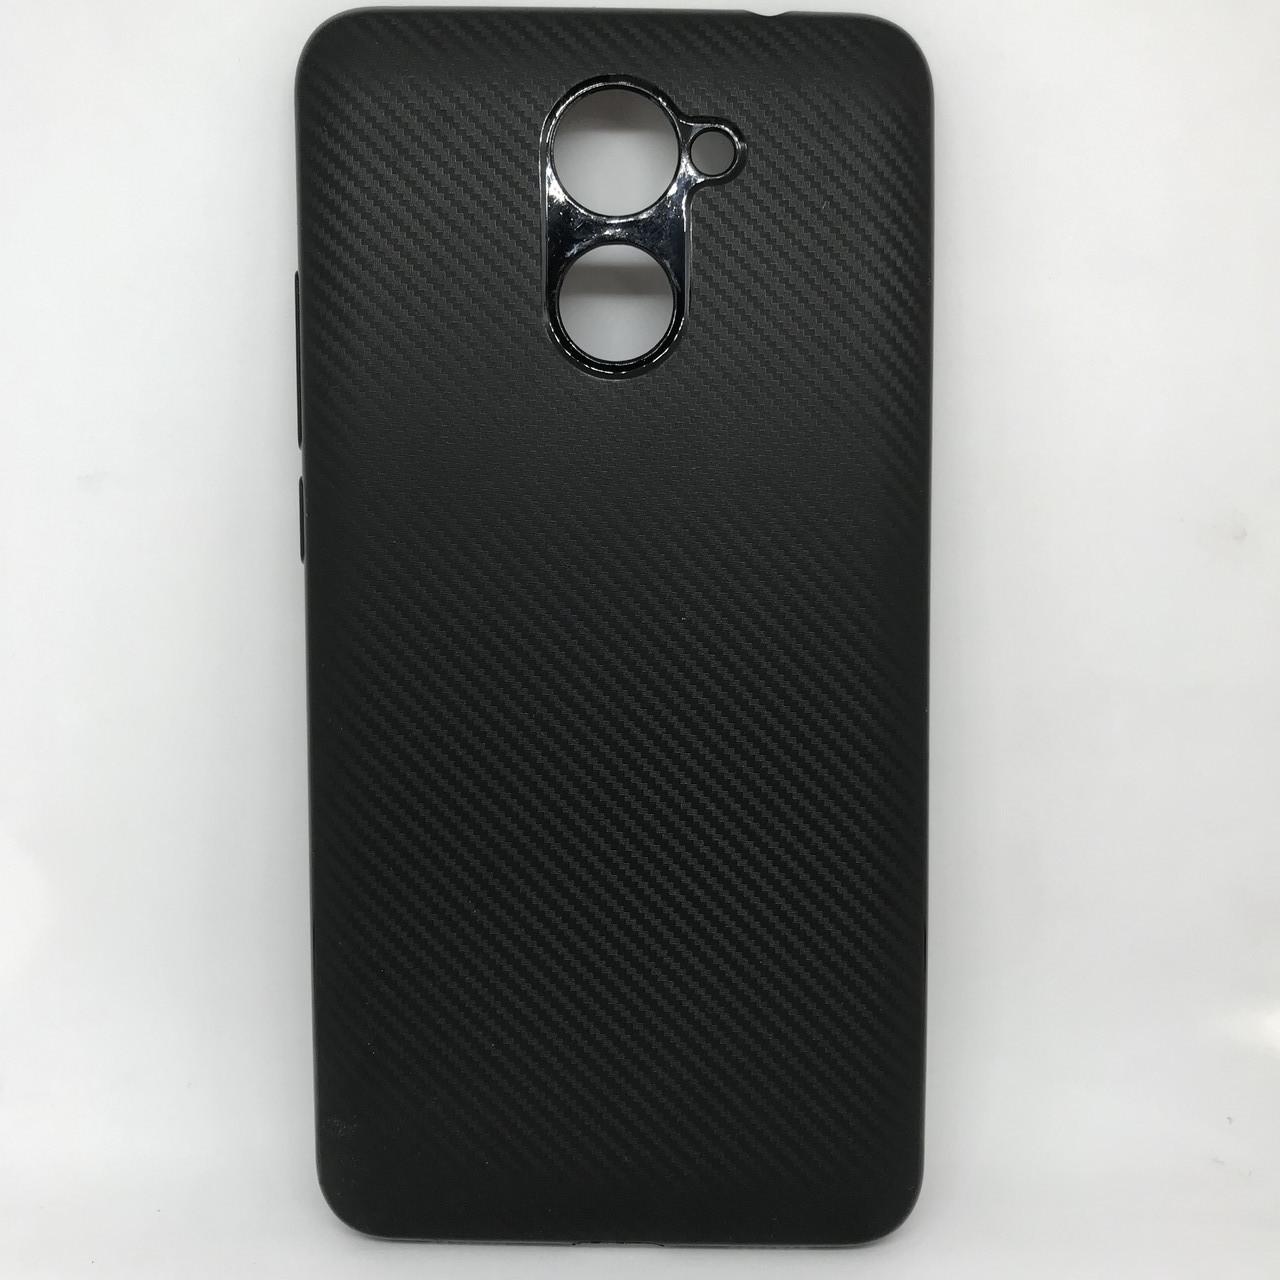 Чехол-накладка silicone Huawei Y7 черный